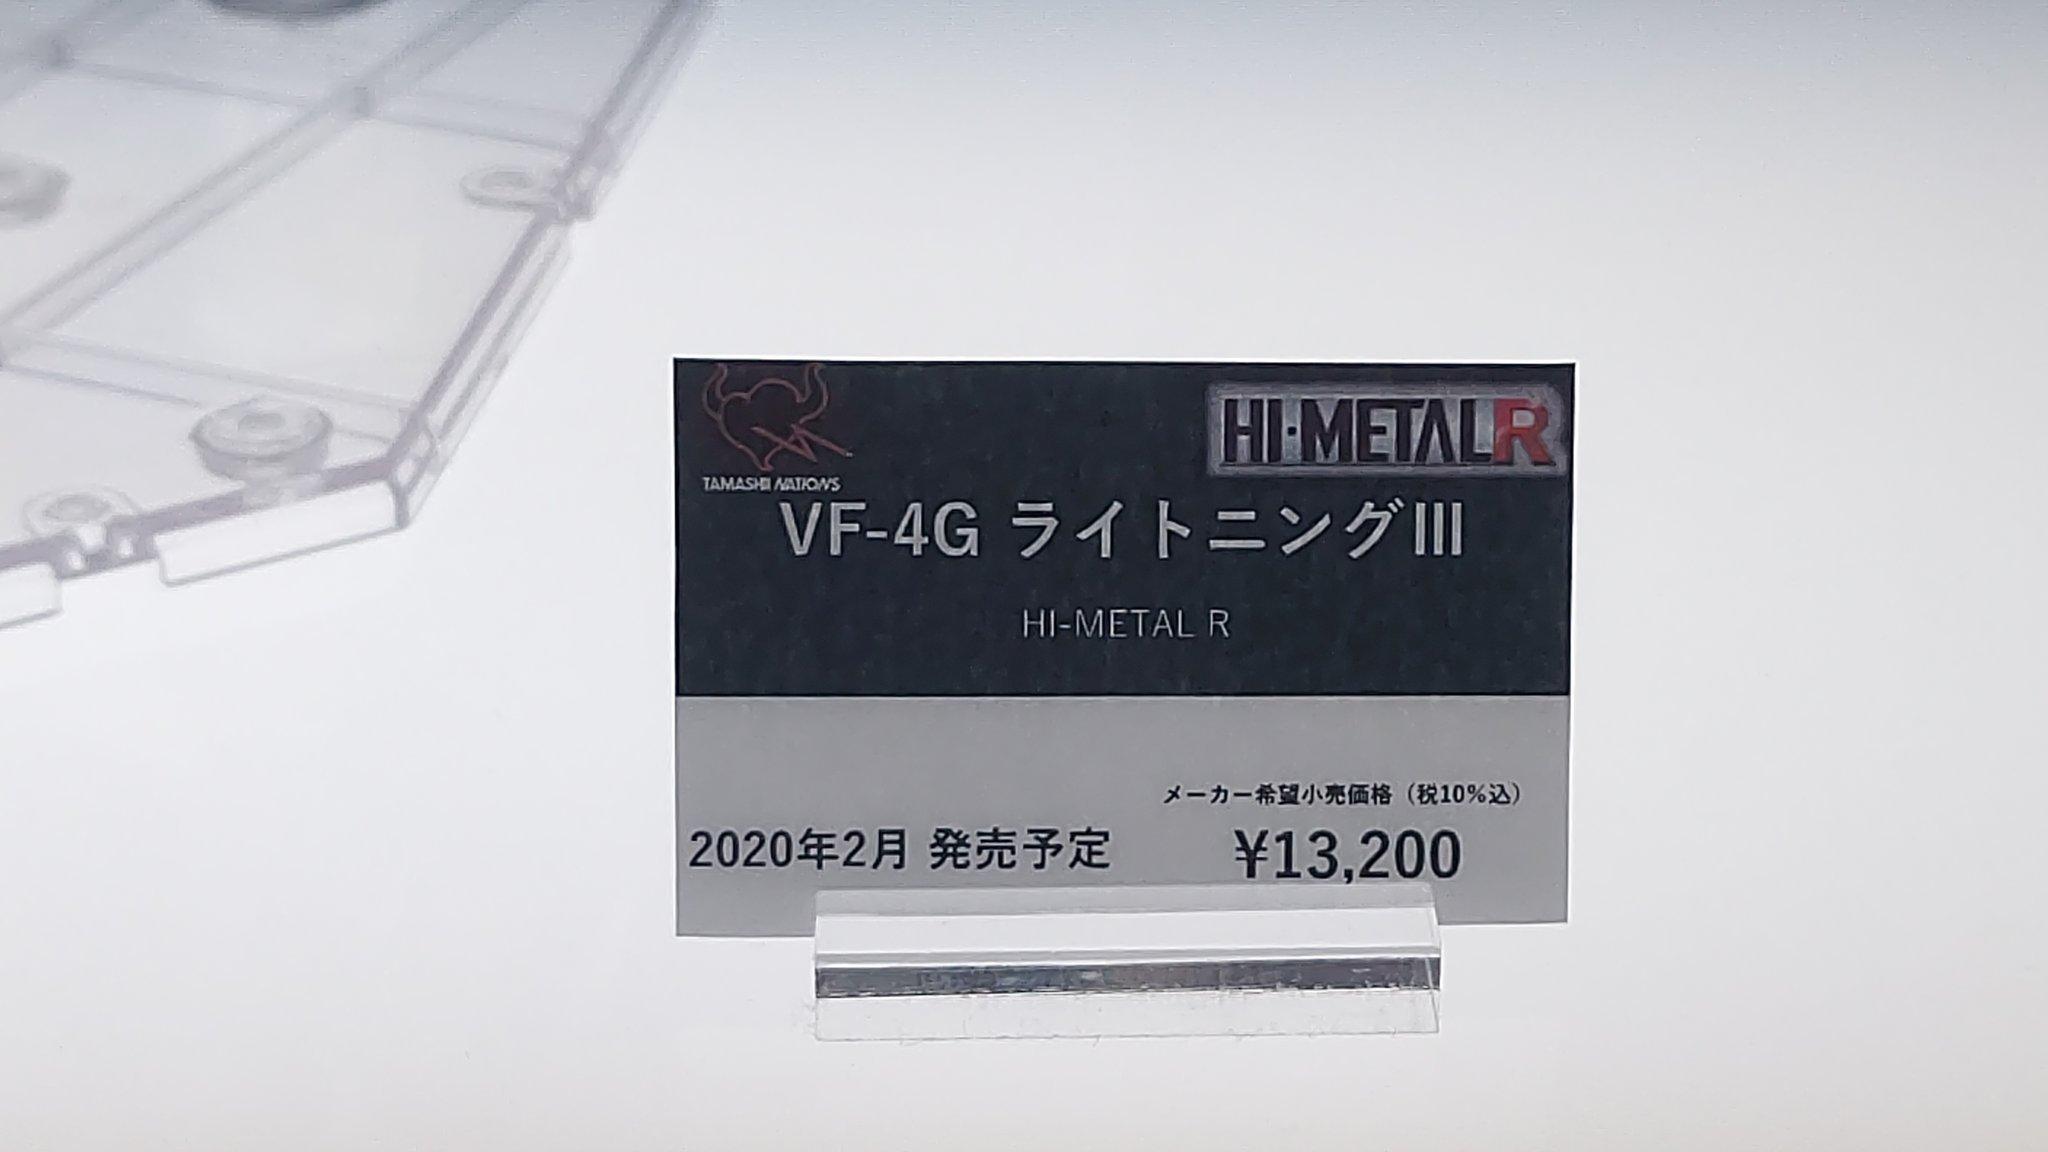 EFcFv6BUcAAI2G7?format=jpg&name=large